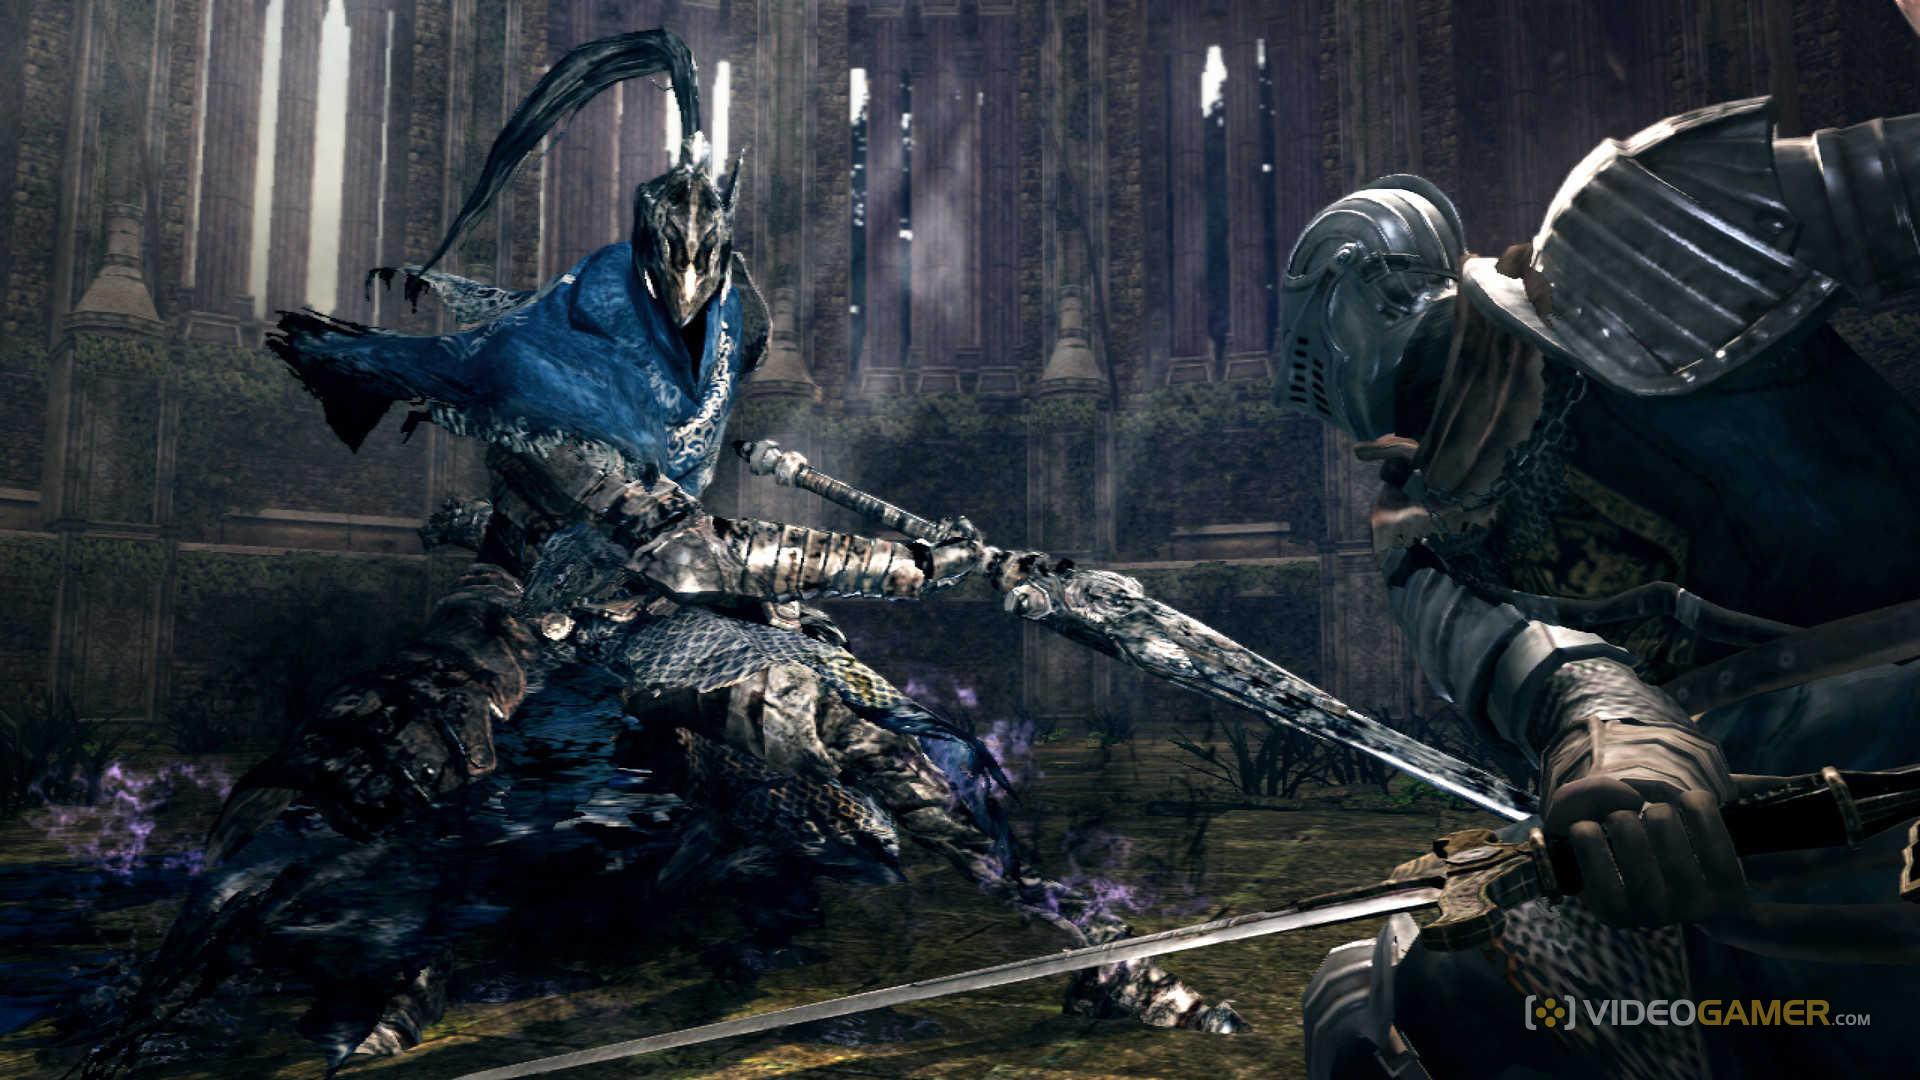 Dark Souls screenshot 74 for Xbox 360   VideoGamercom 1920x1080